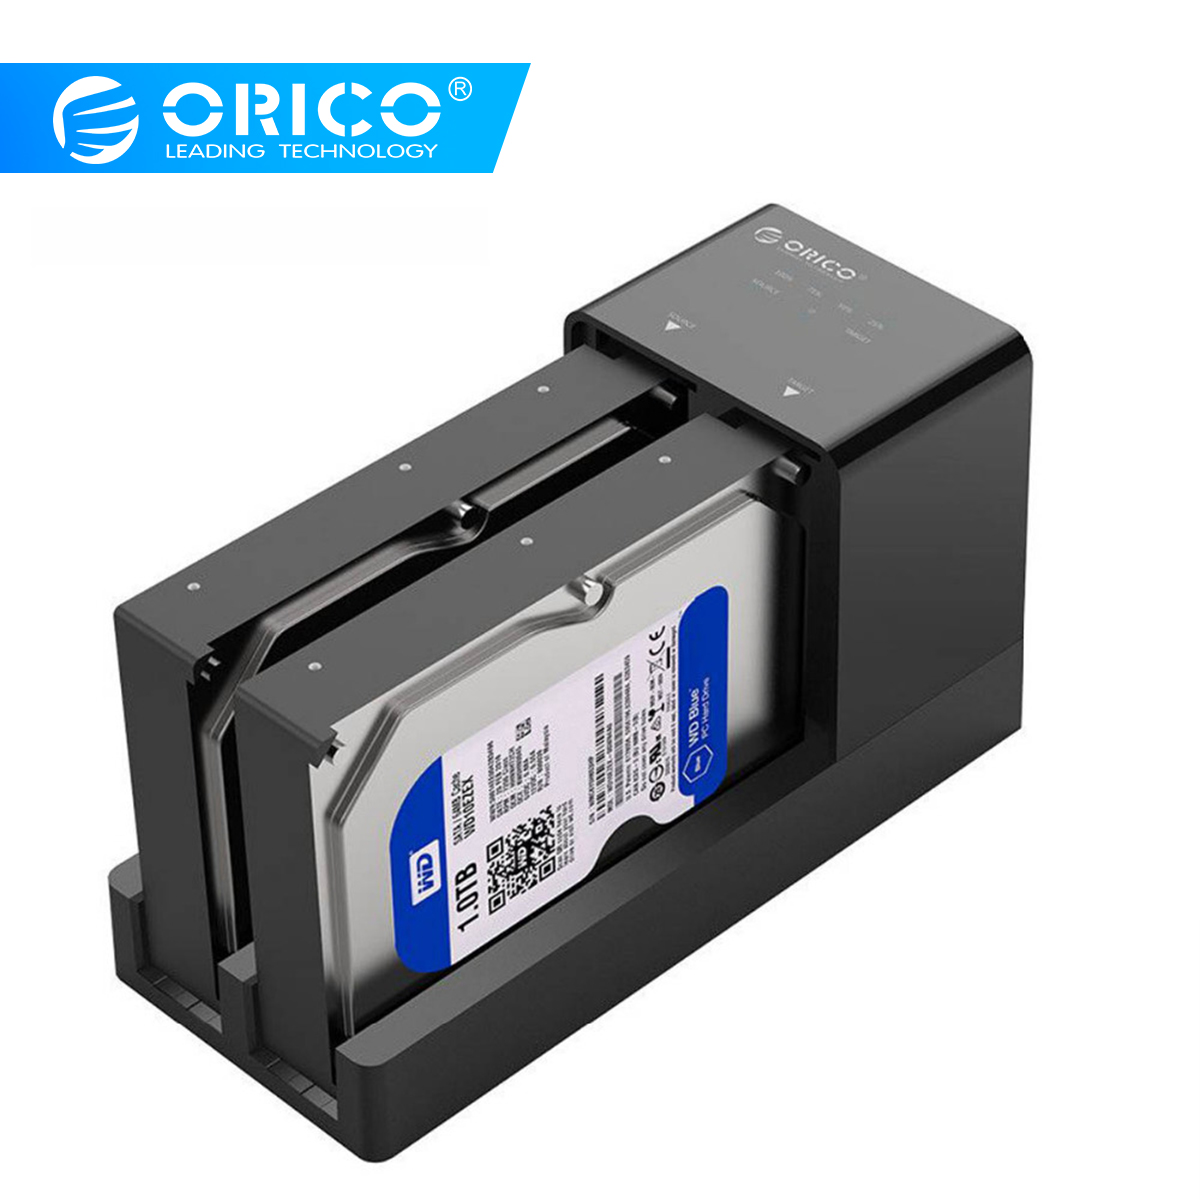 ORICO 2 5 3 5 SATA HDD Enclosure Docking Station Offline Clone Super Speed USB 3